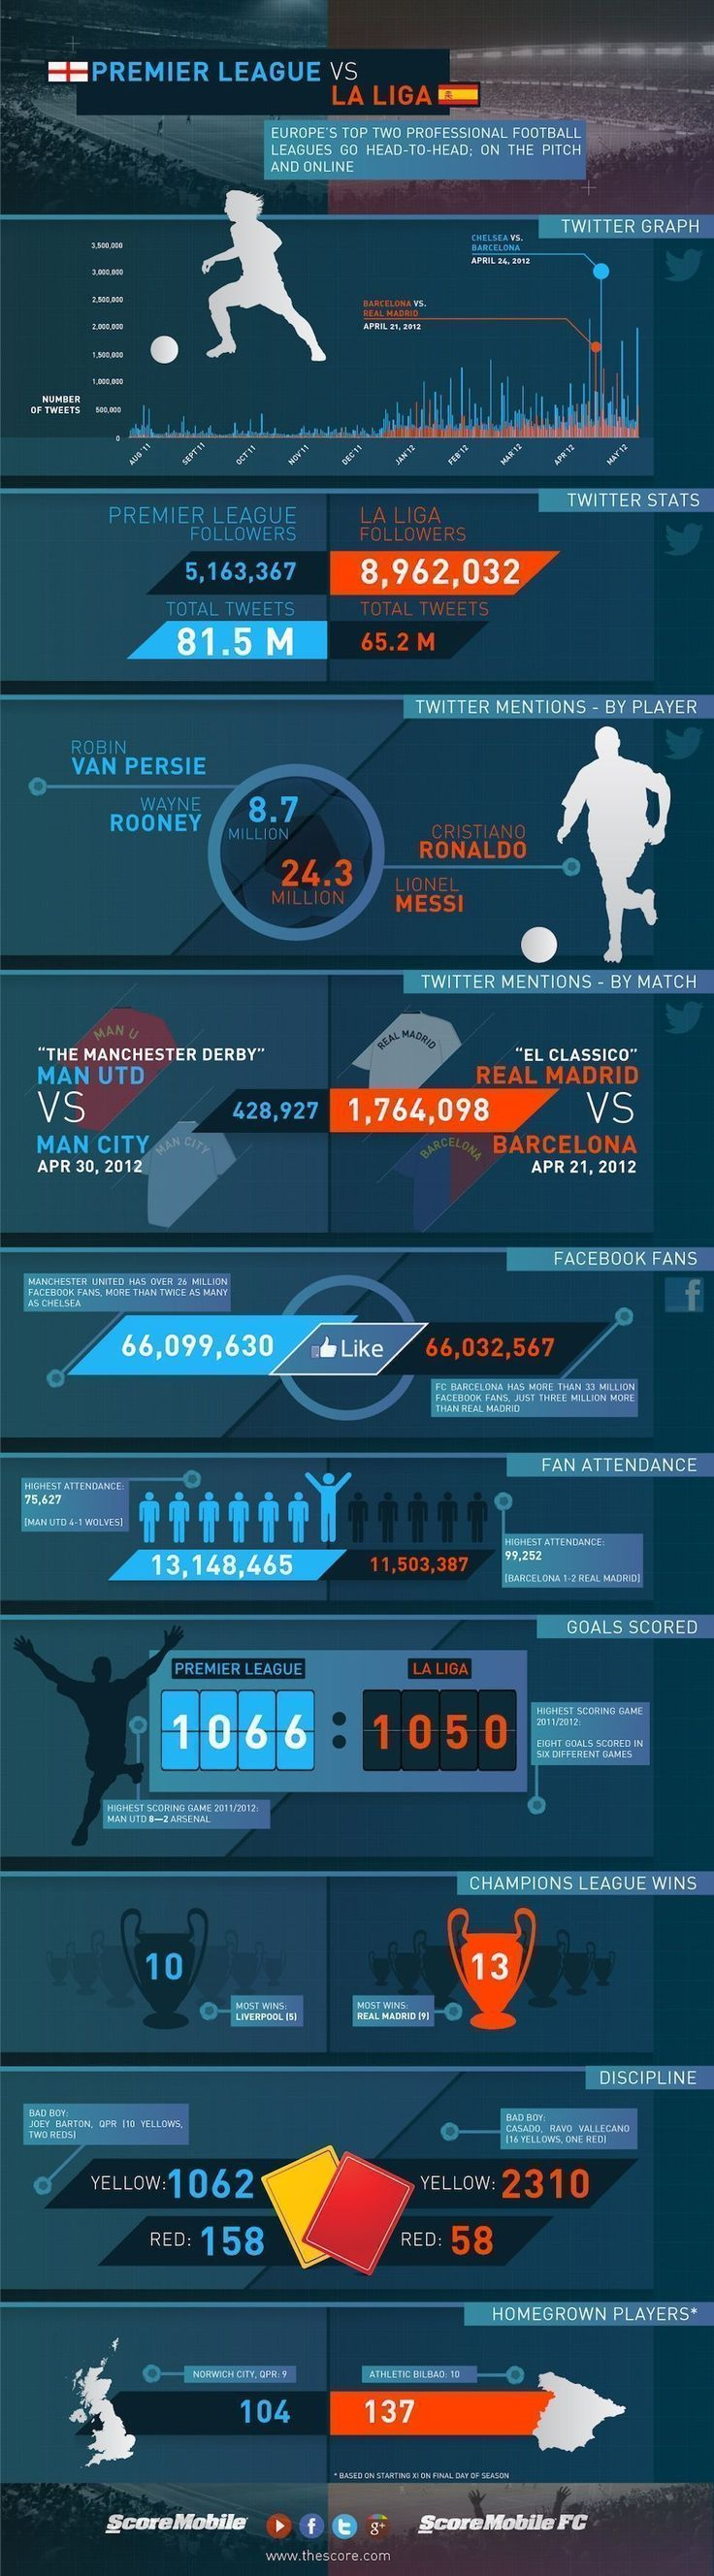 Premier League vs. La Liga Who Takes European Soccer's Social Media Crown? [INFOGRAPHIC] #soccerinfographic